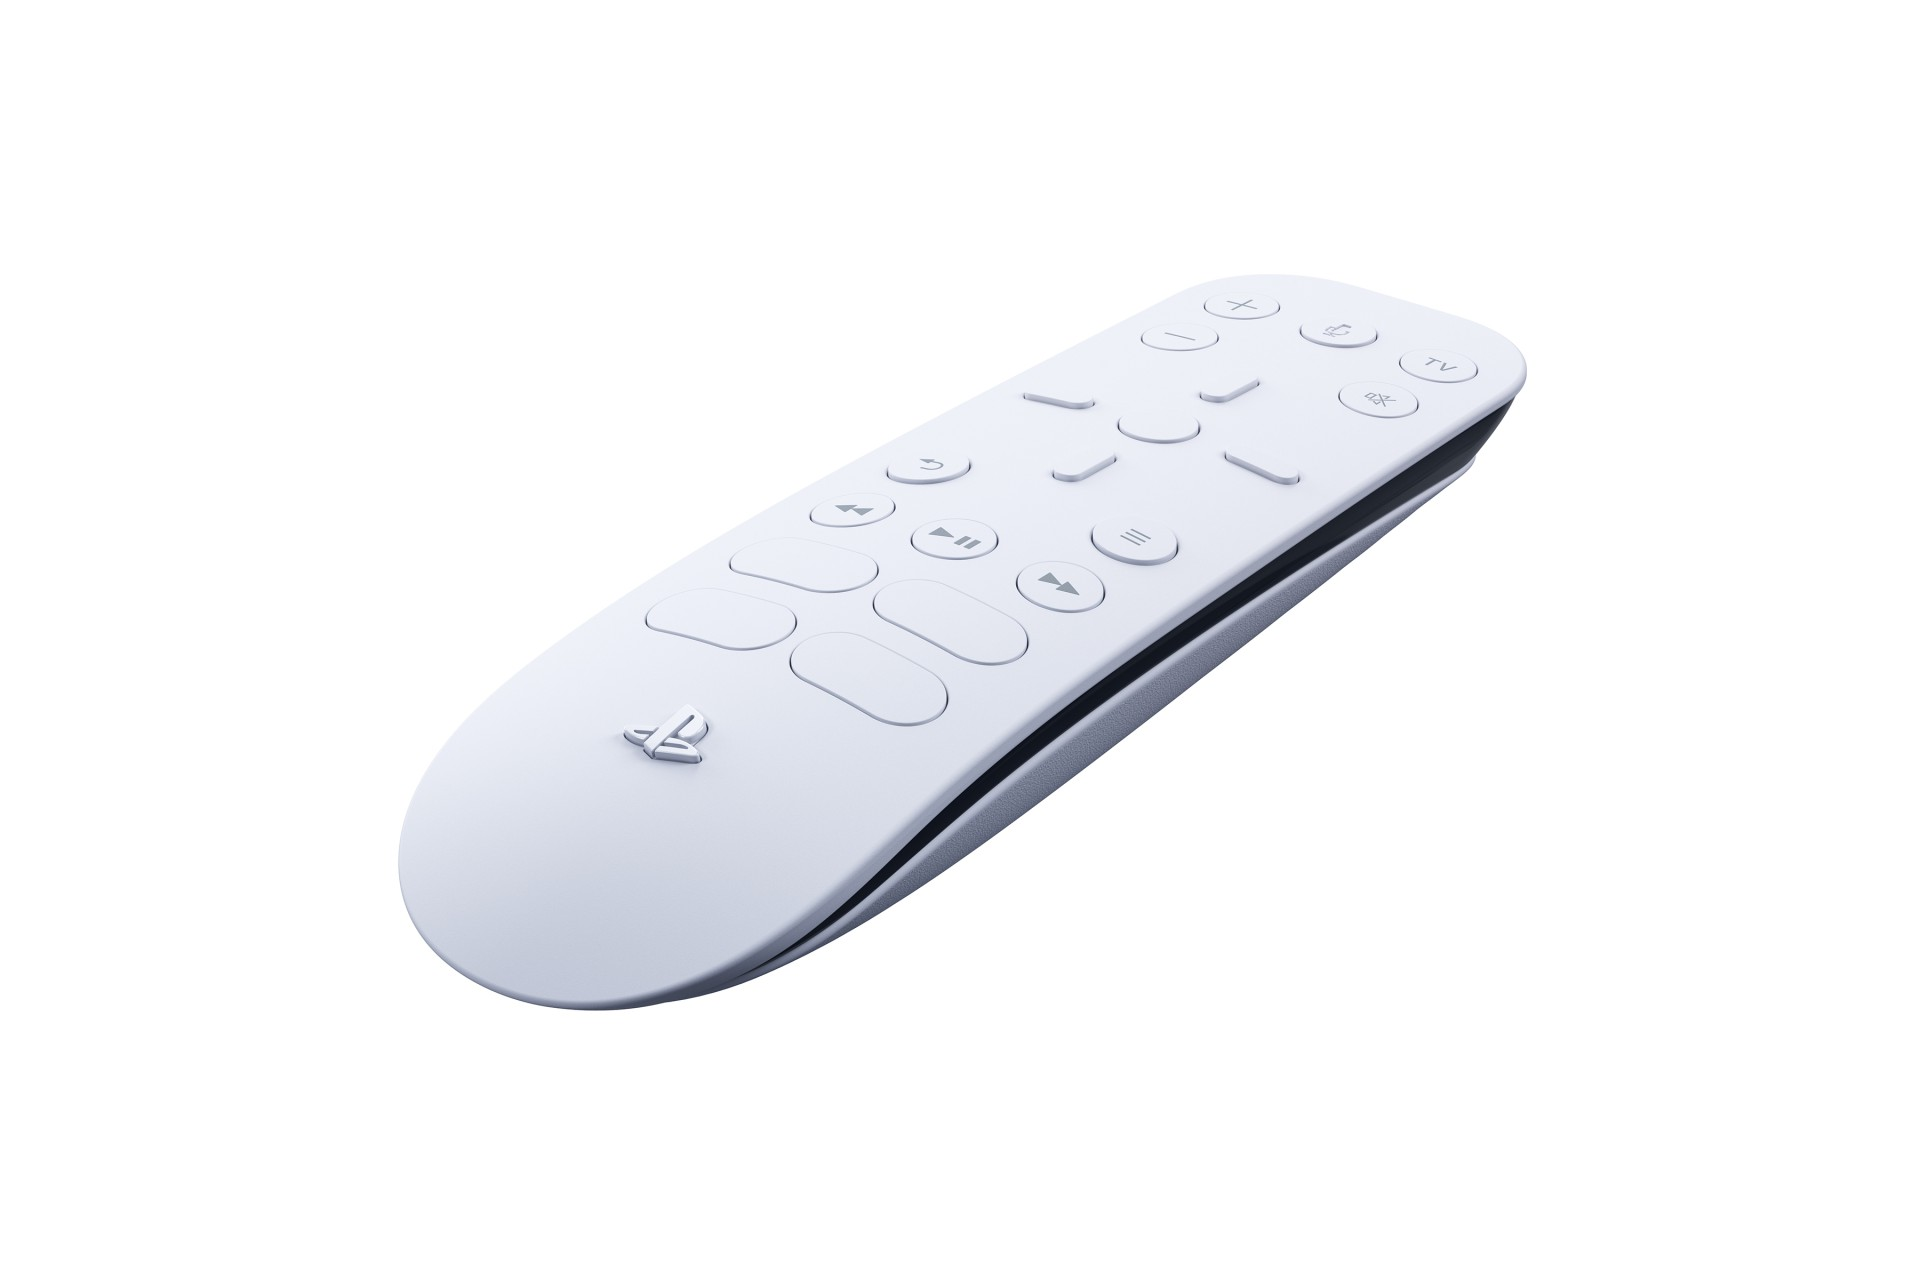 PS5真机造型公开 首发可选择无光驱版本 (5)